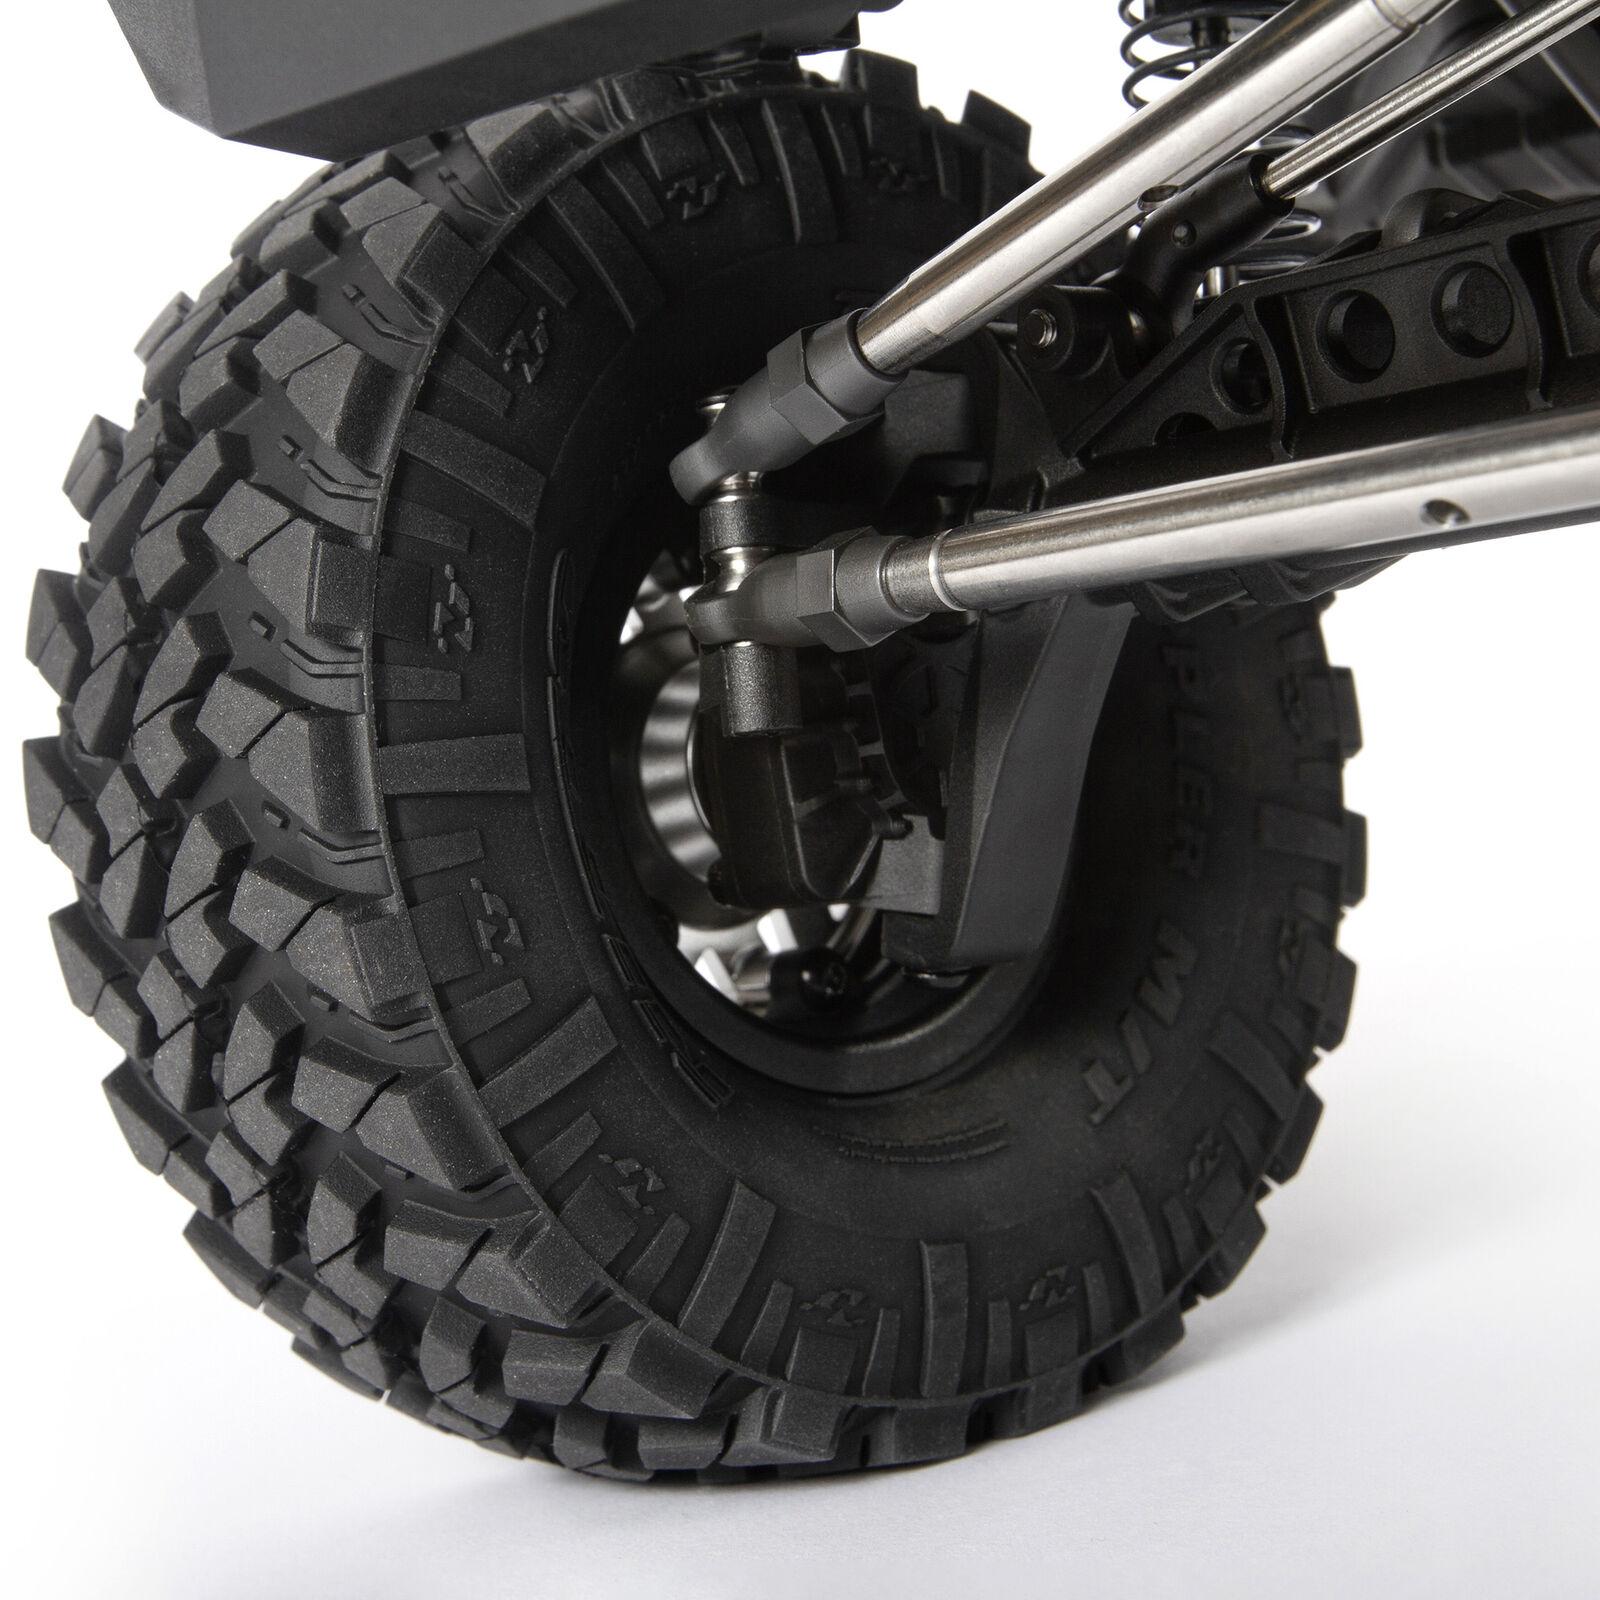 1/10 SCX10 III Jeep JLU Wrangler with Portals 4WD Kit